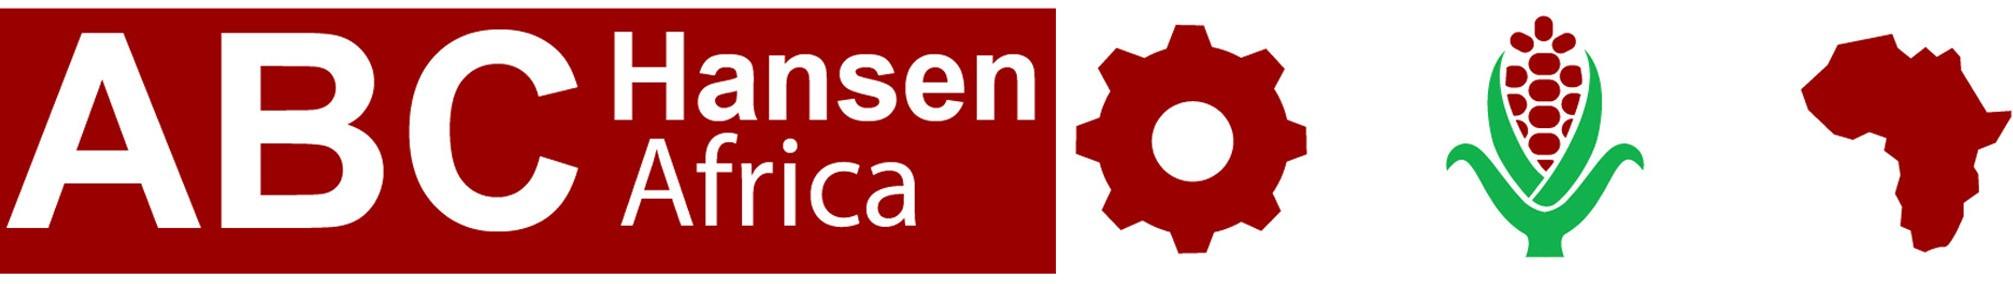 ABC Hansen Shop